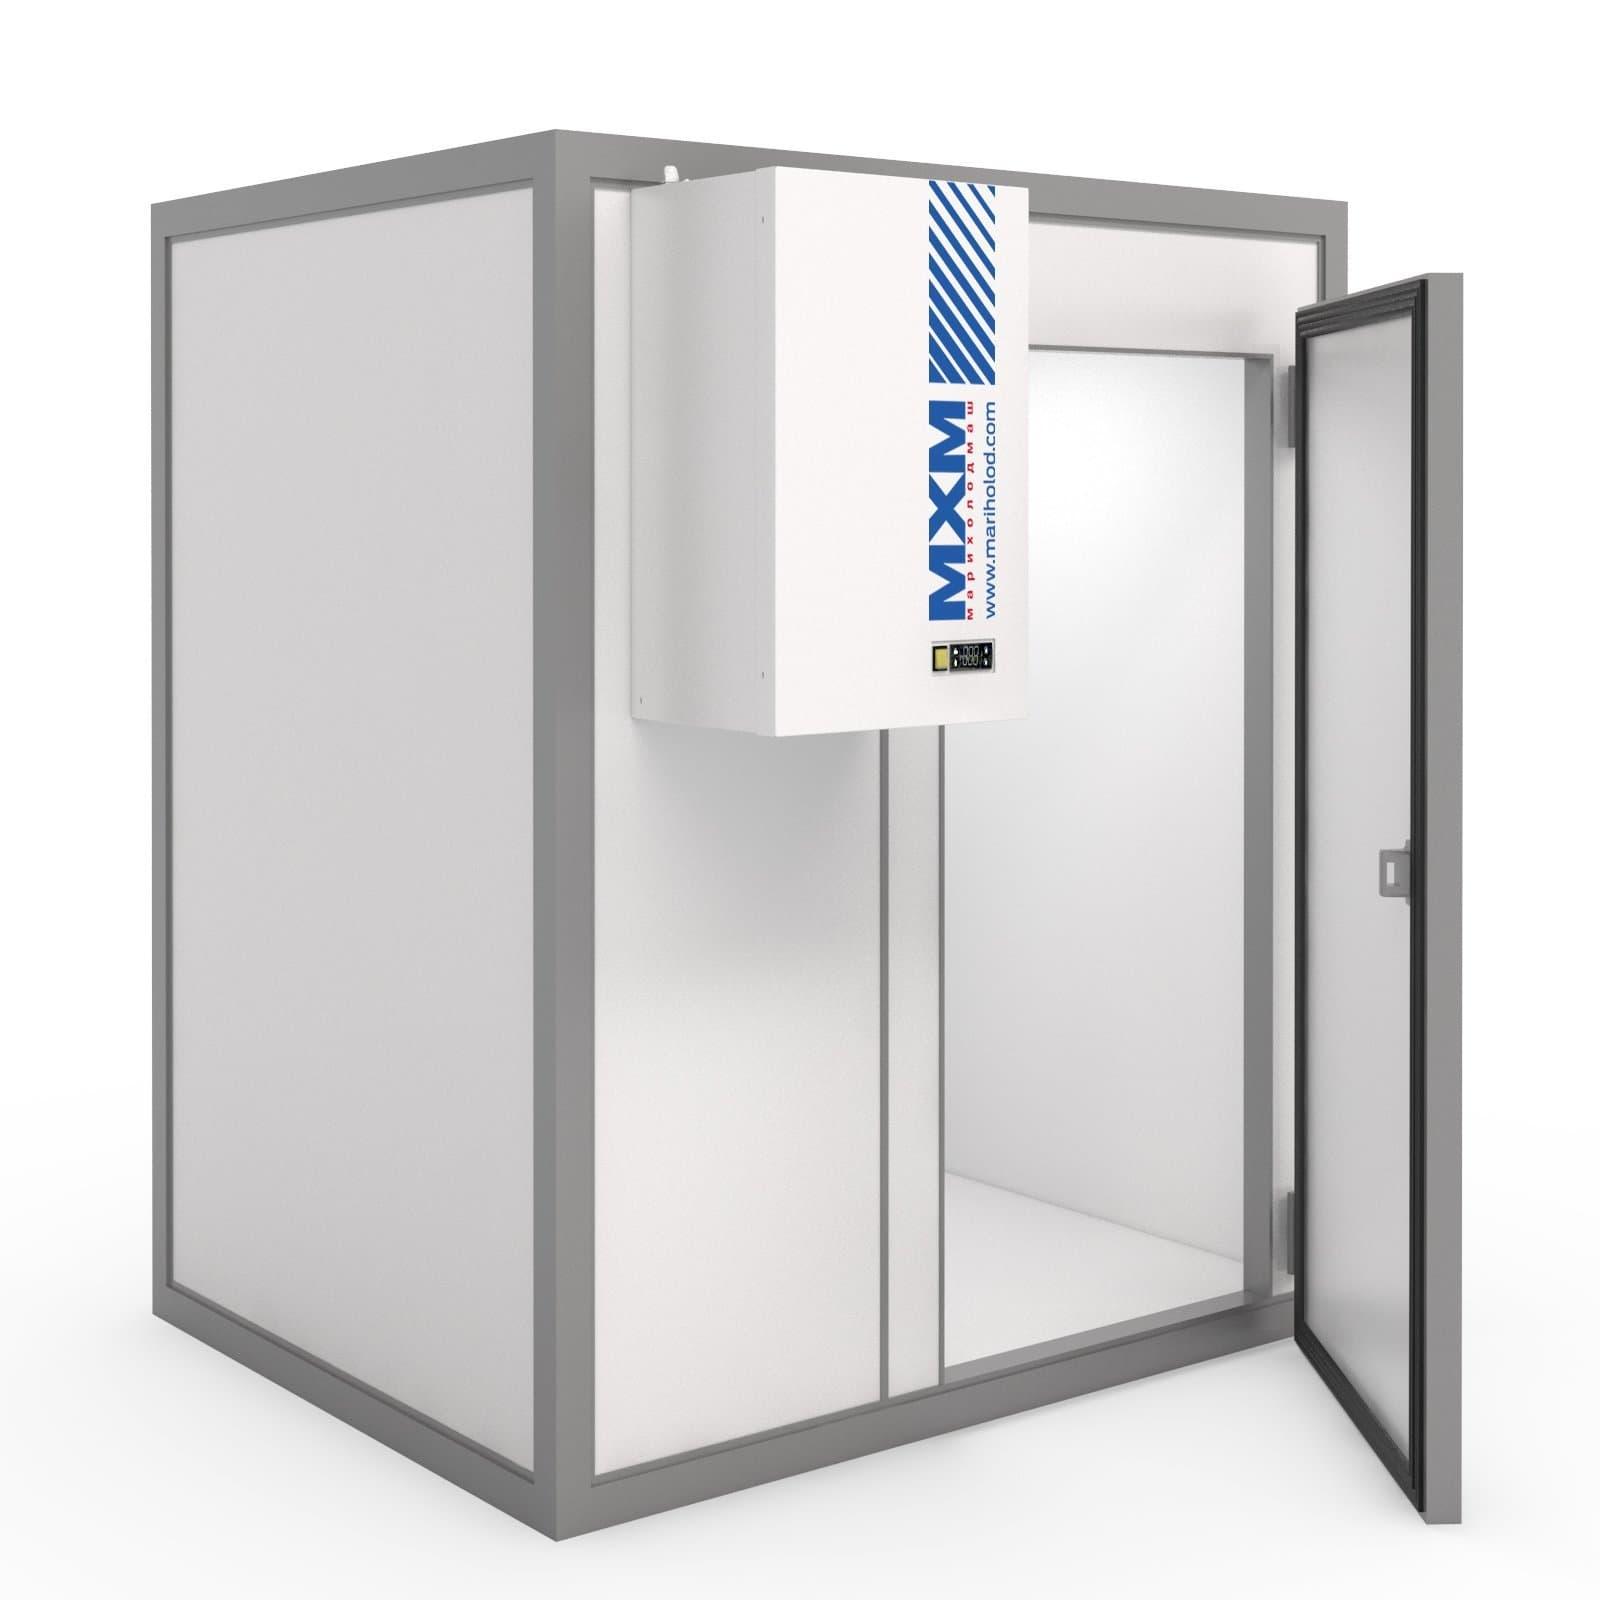 Камера холодильная МХМ КХН-59,67 1660×19660×2200